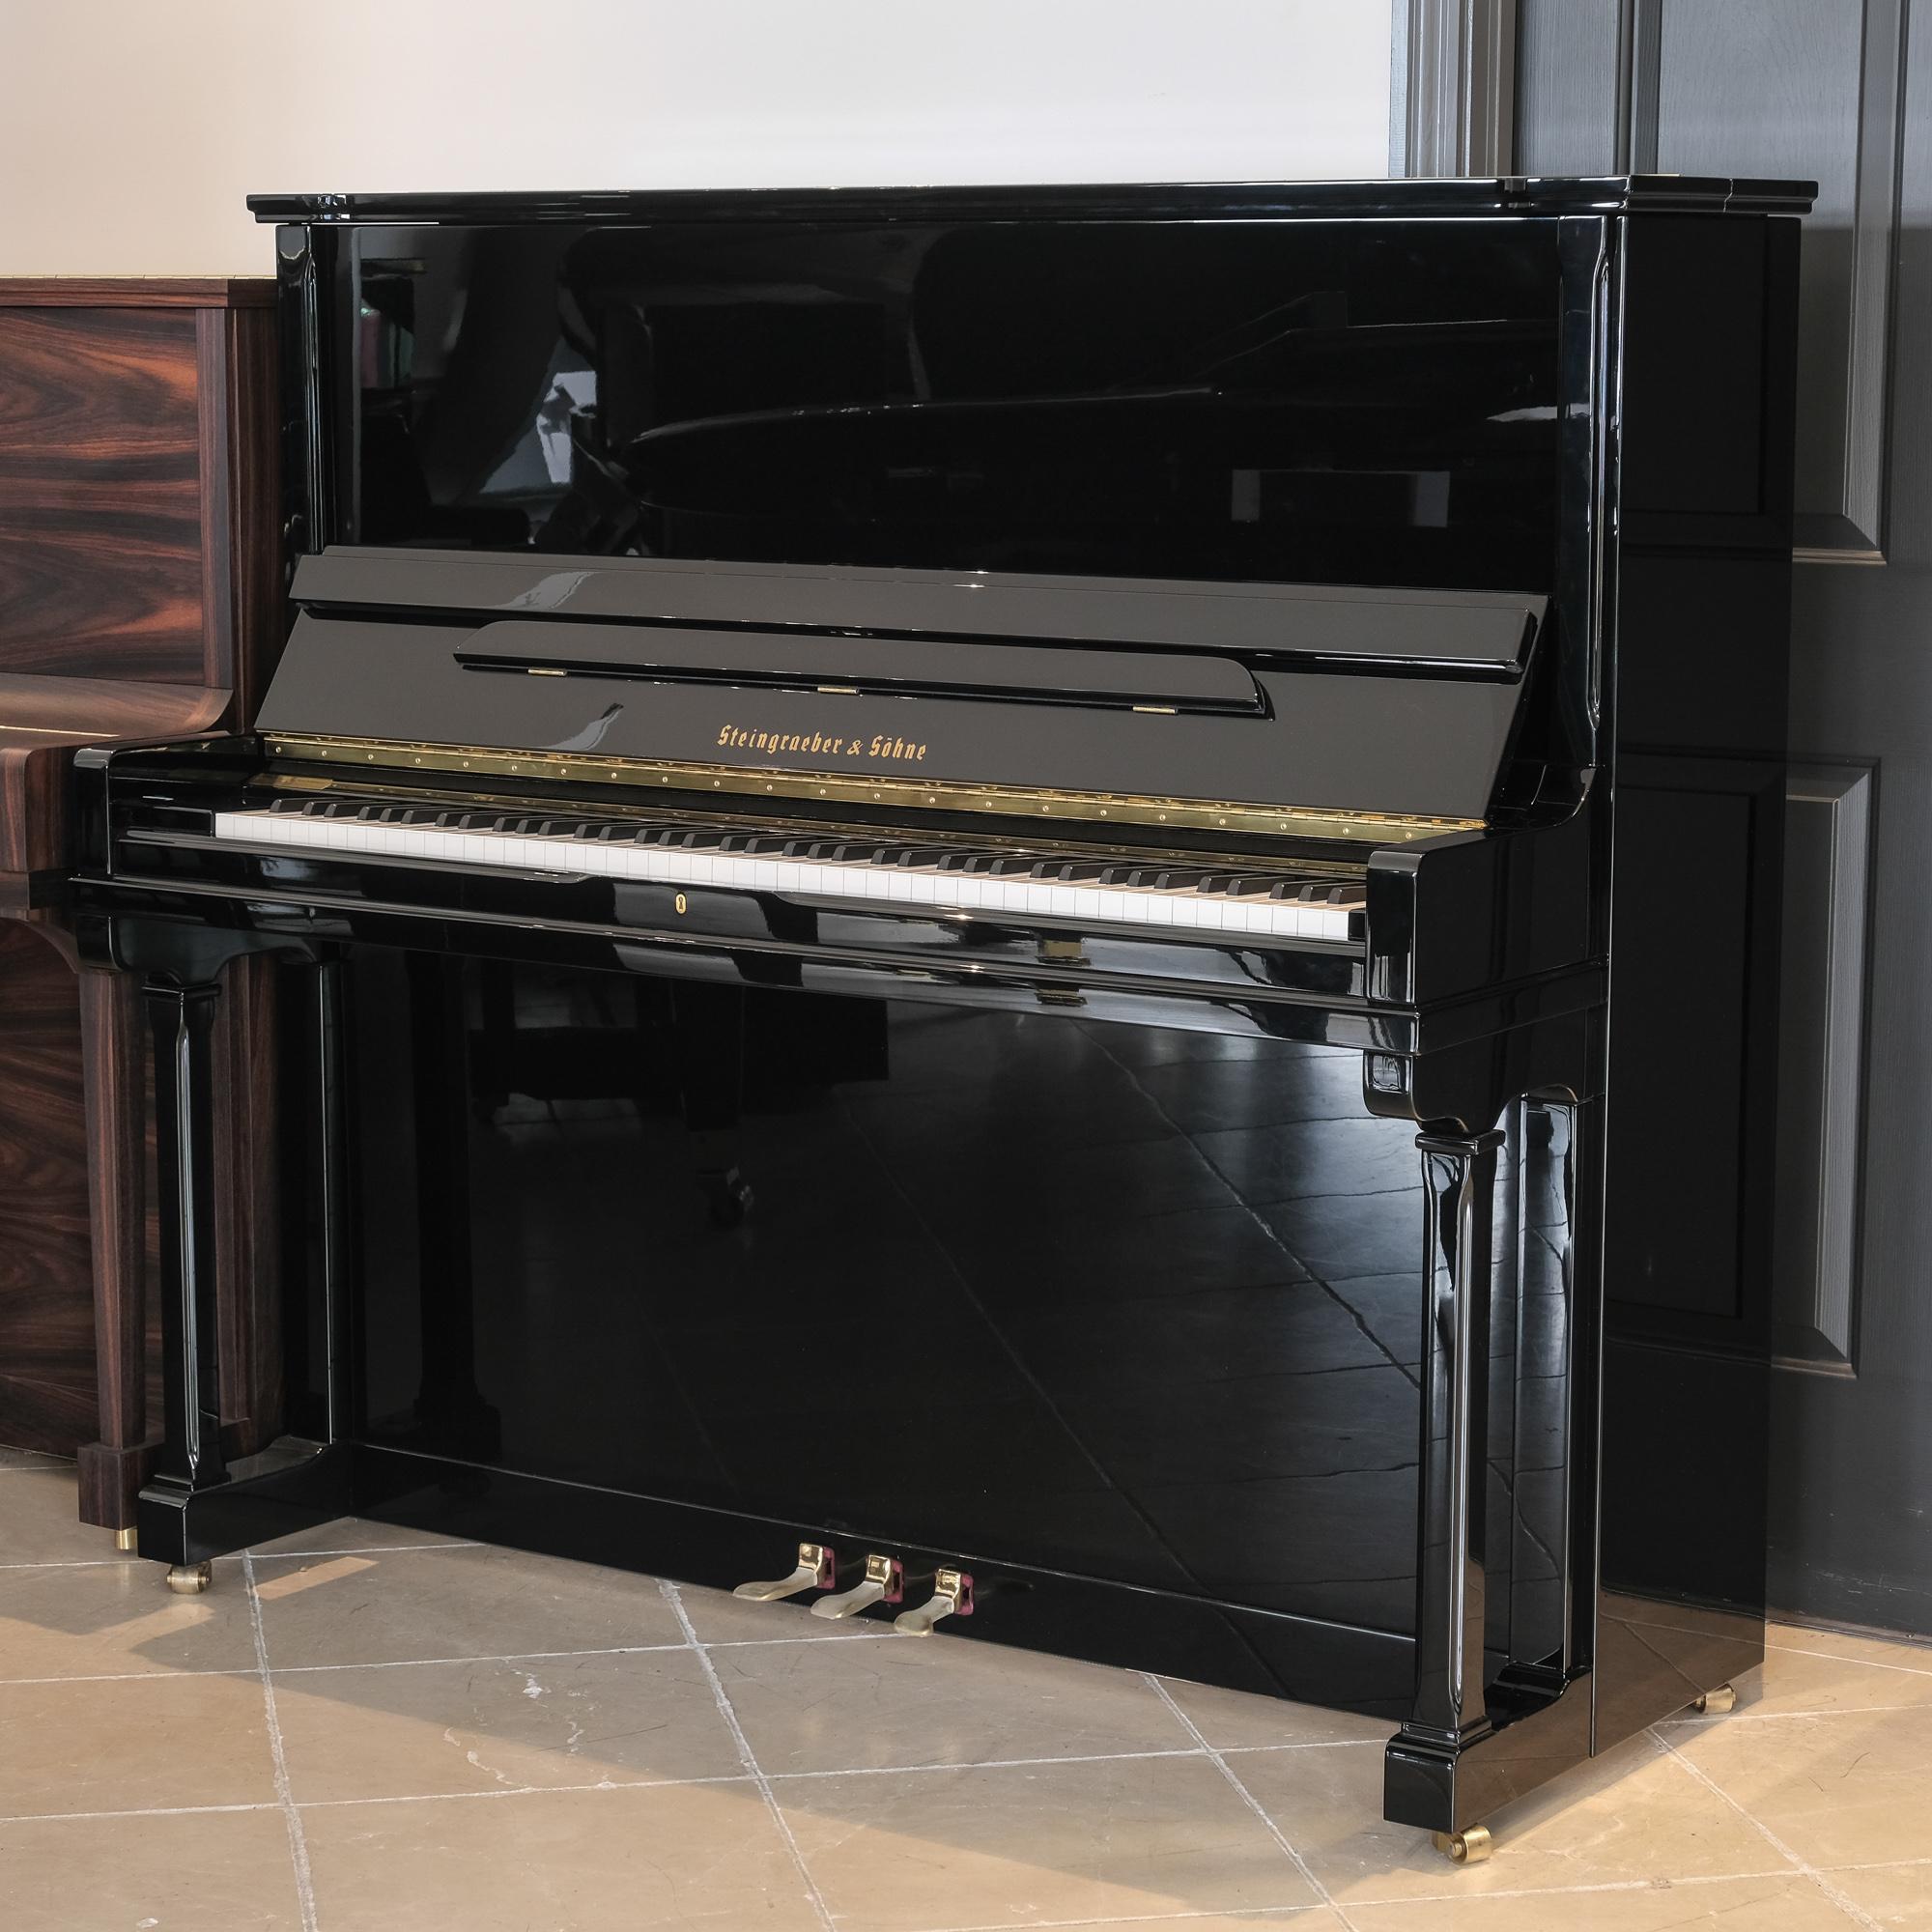 New Steingraeber & Sohne 138 Upright Piano